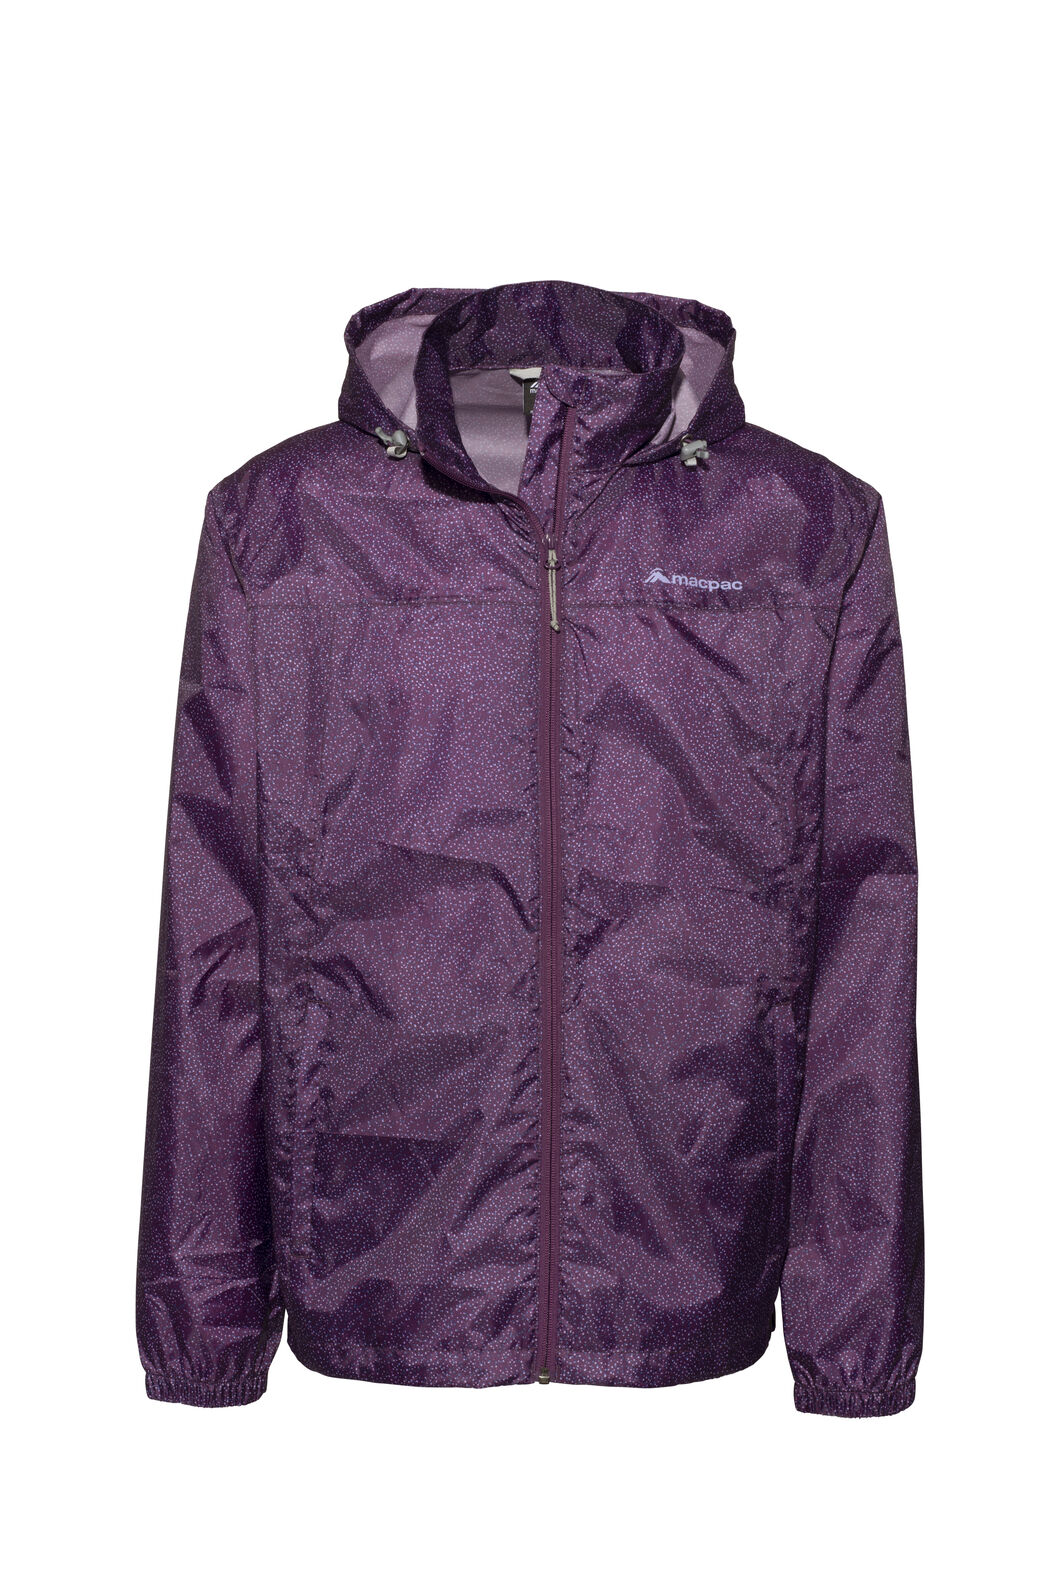 Macpac Pack-It-Jacket — Unisex, Wineberry Speckle Print, hi-res